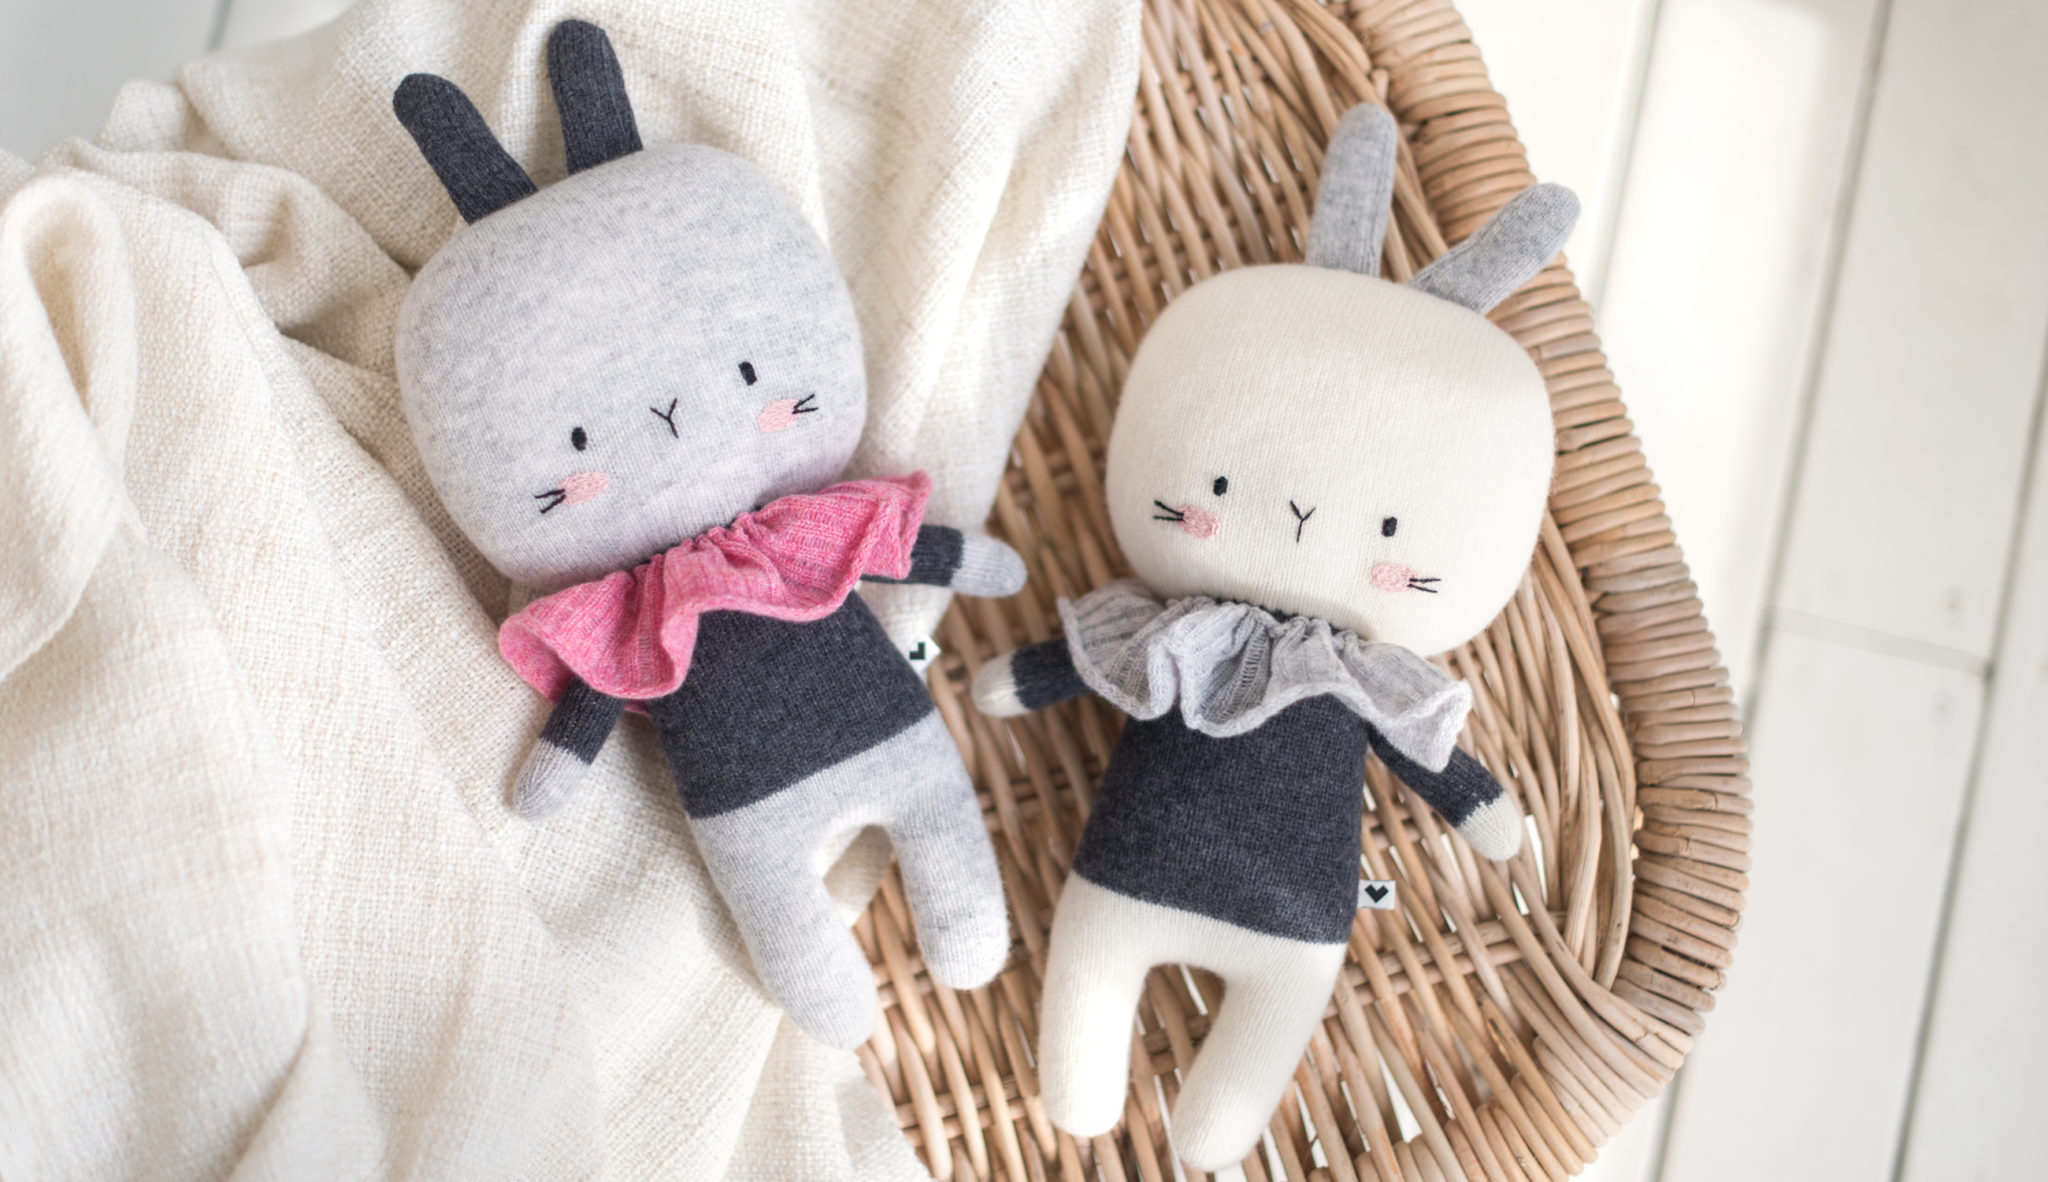 lauvely-bunnies-ava-arlo-1